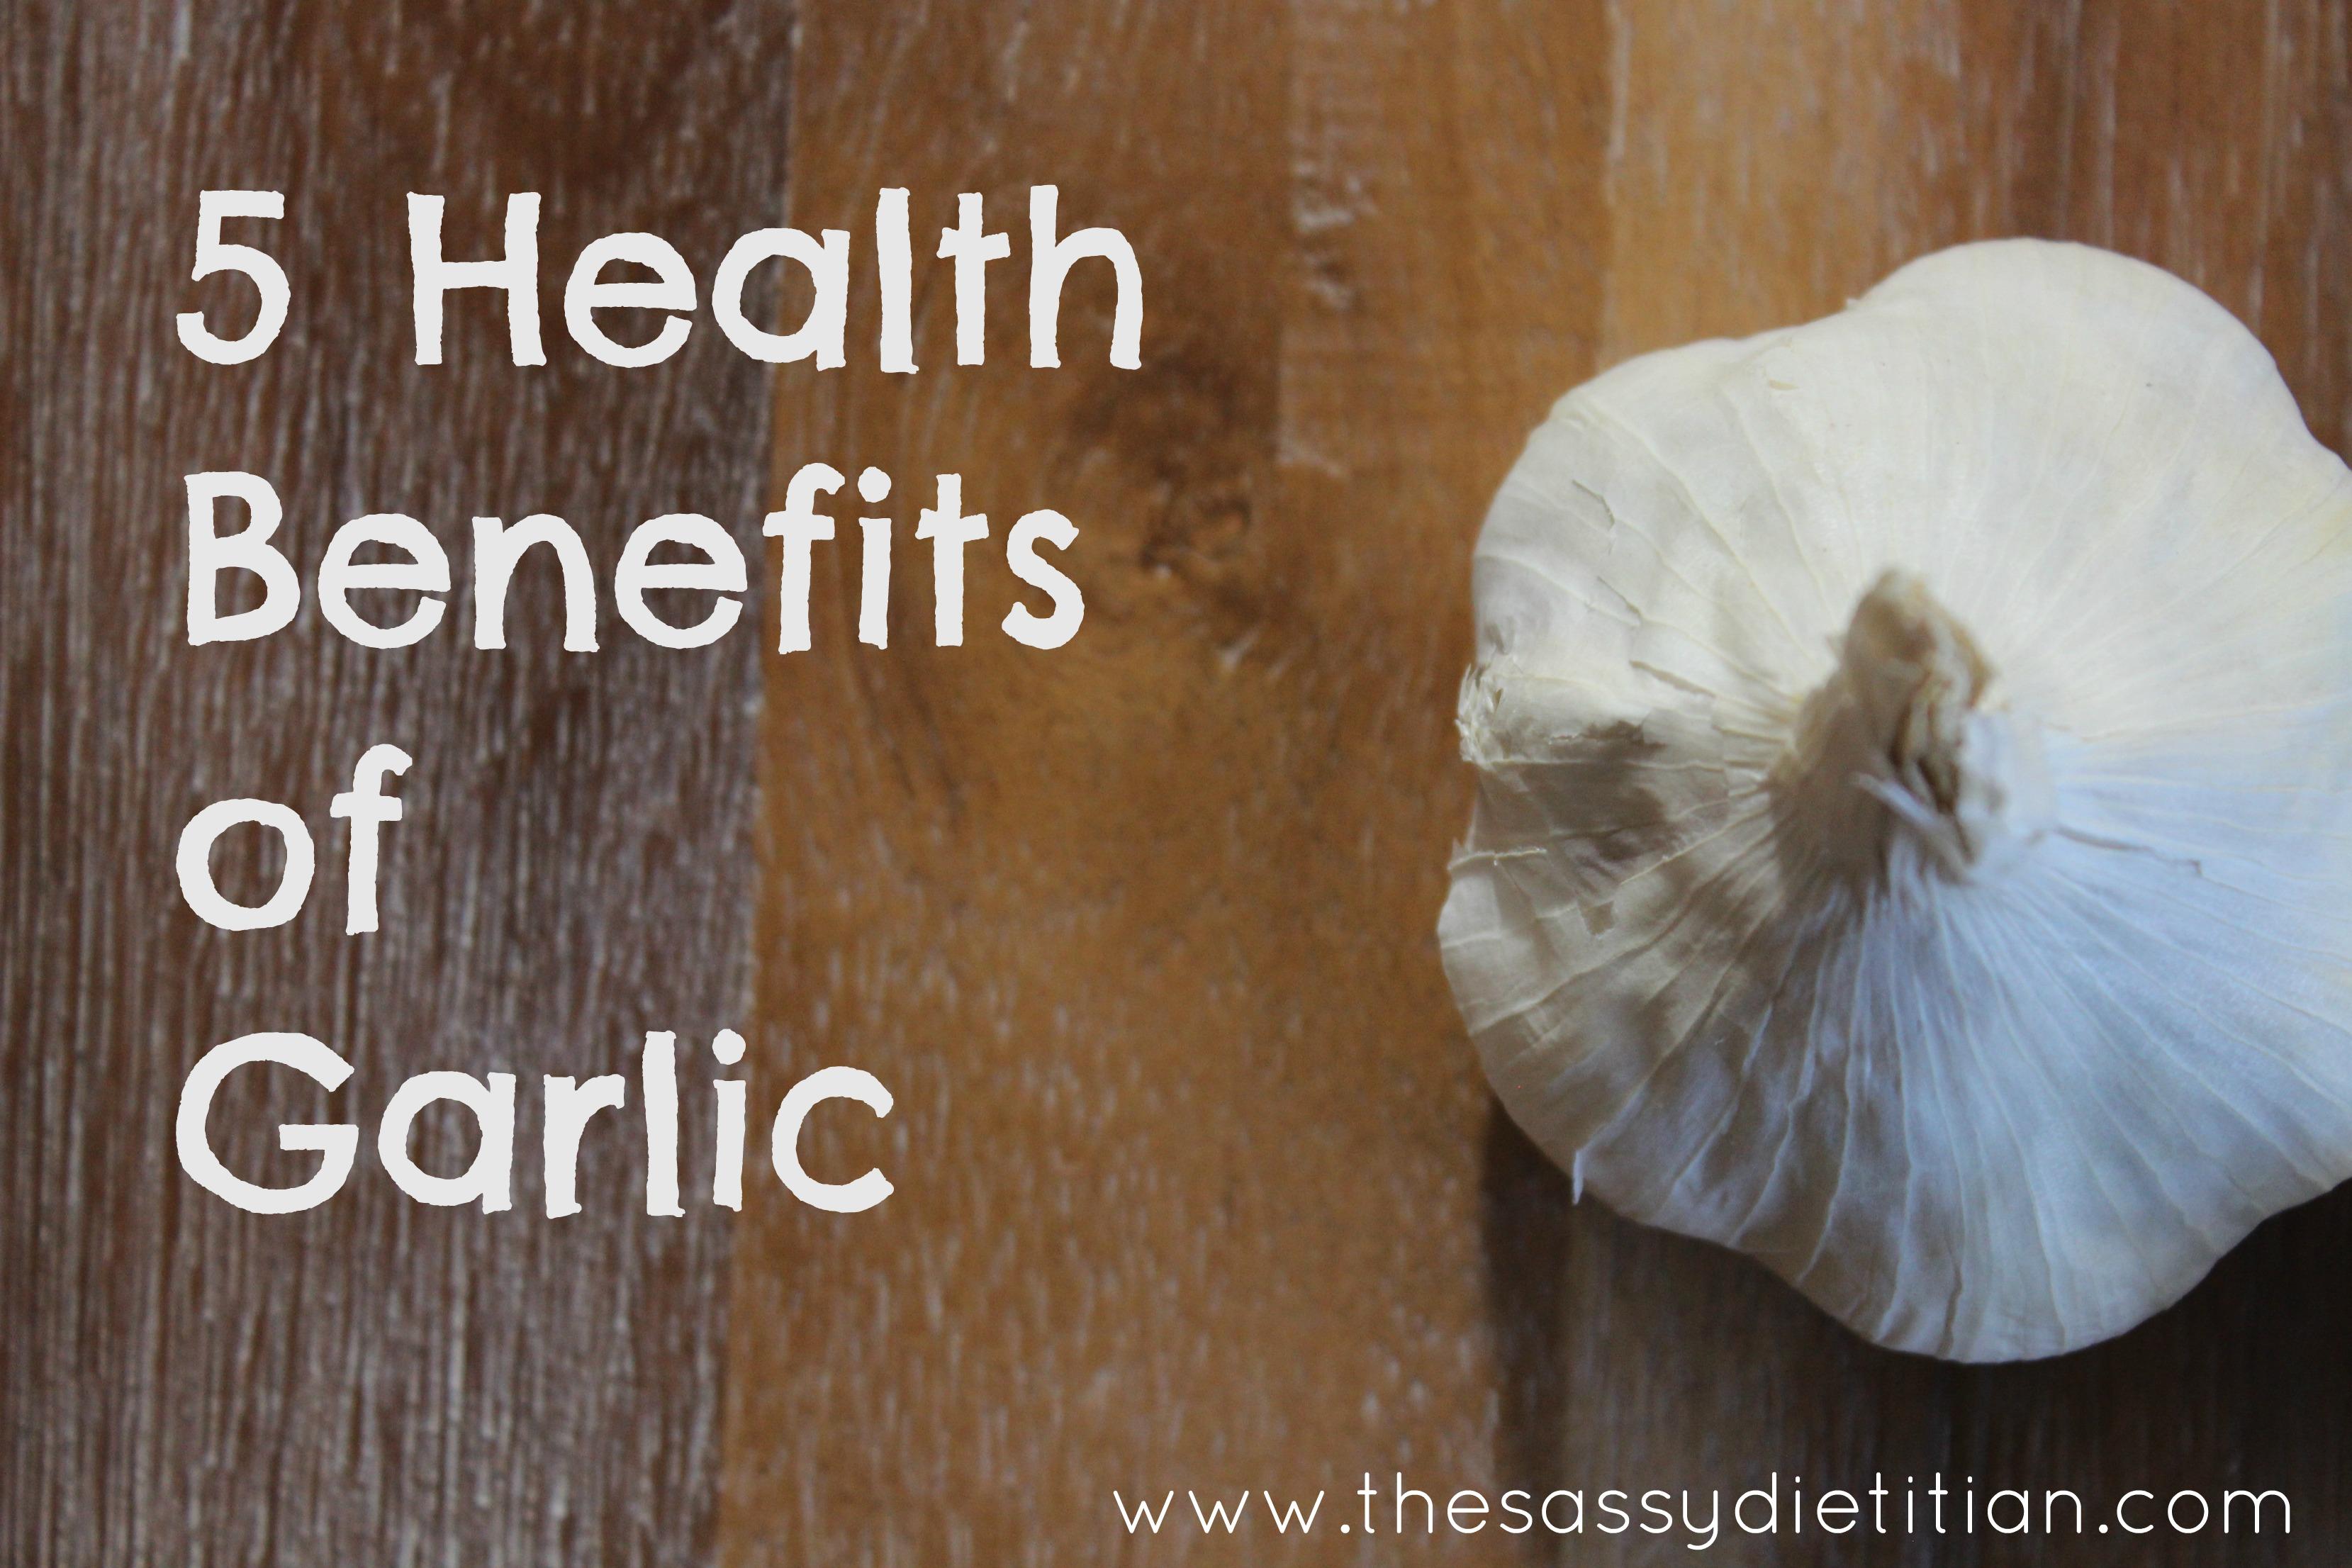 5 Health Benefits of Garlic -